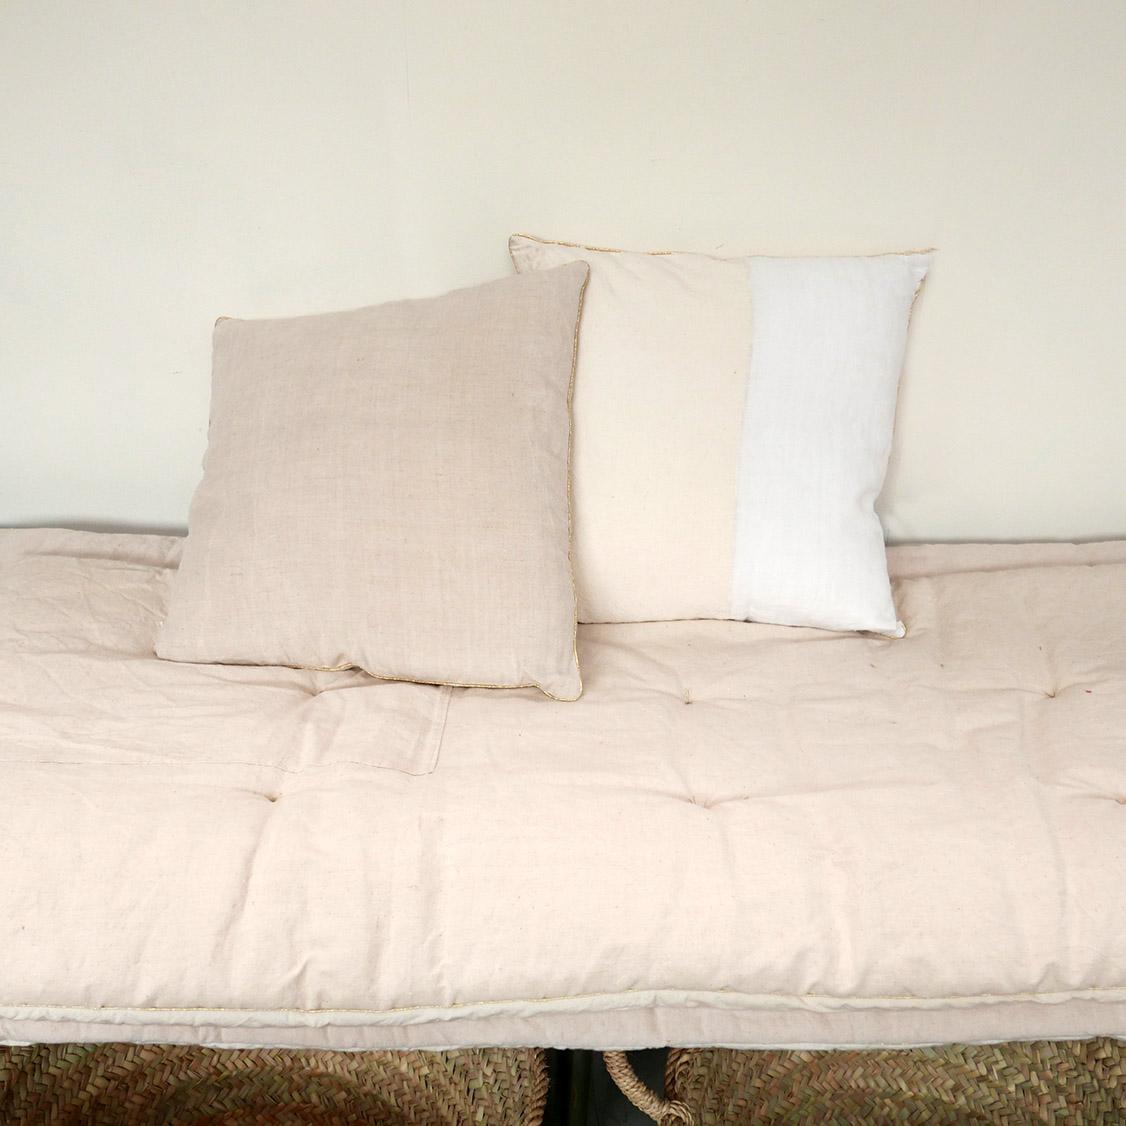 coussin en tissu ancien v 1 chez les voisins. Black Bedroom Furniture Sets. Home Design Ideas